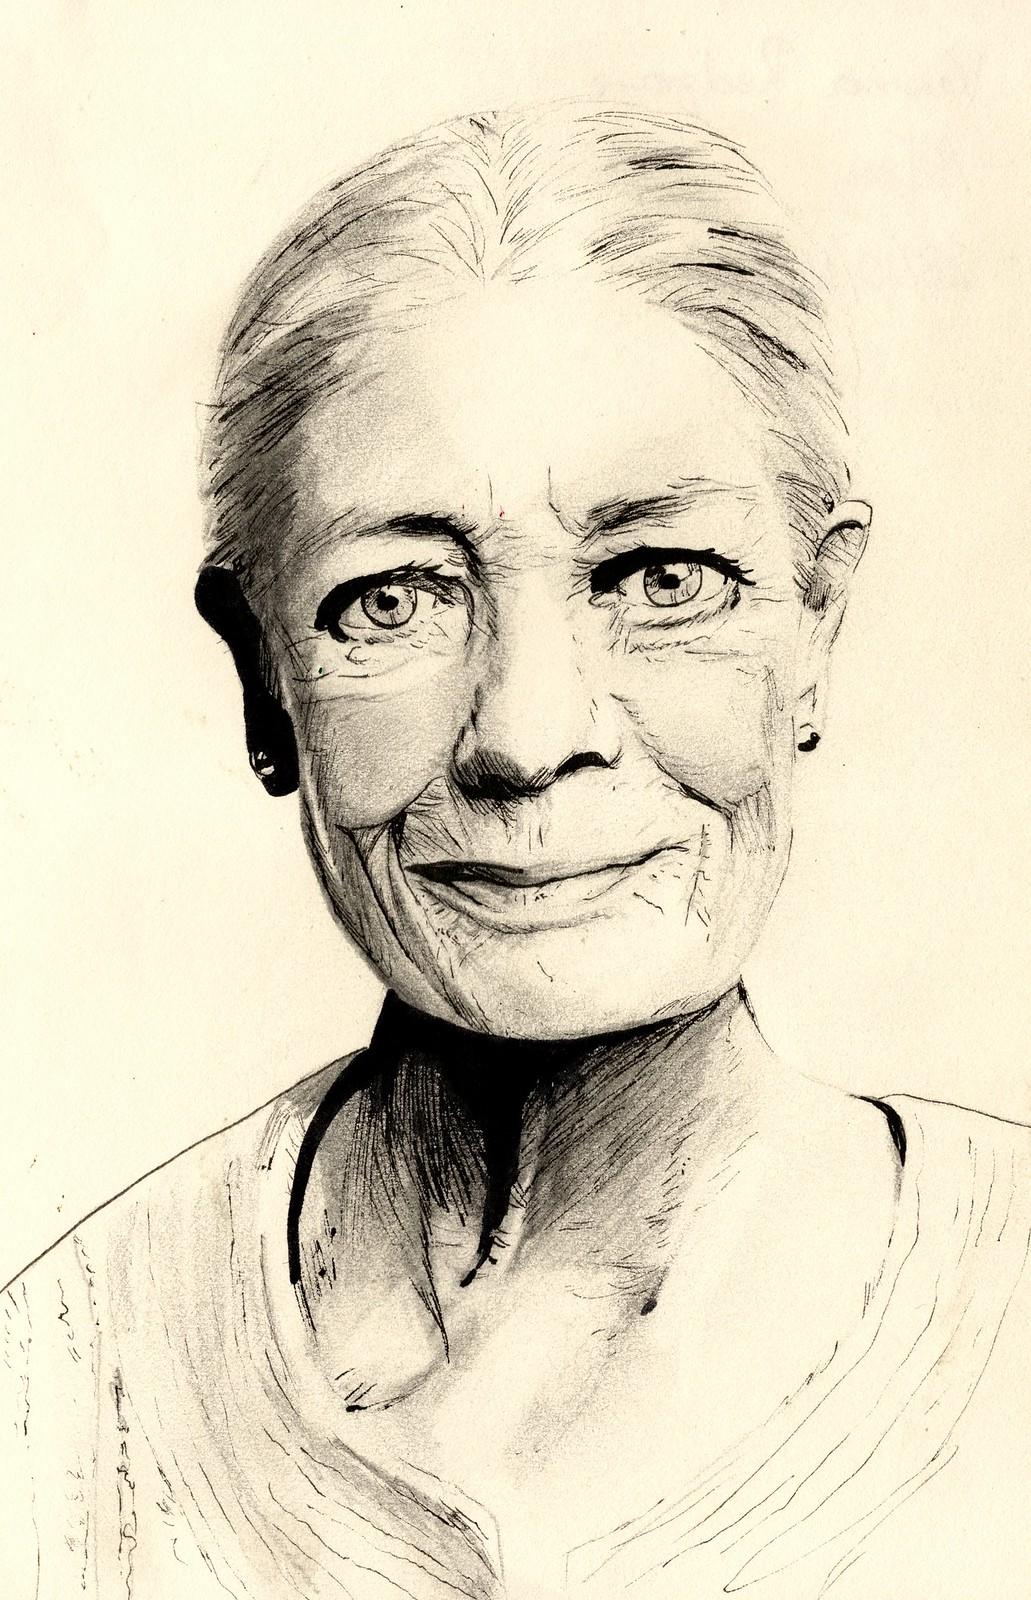 Sketchbook - Vanessa Redgrave Portrait